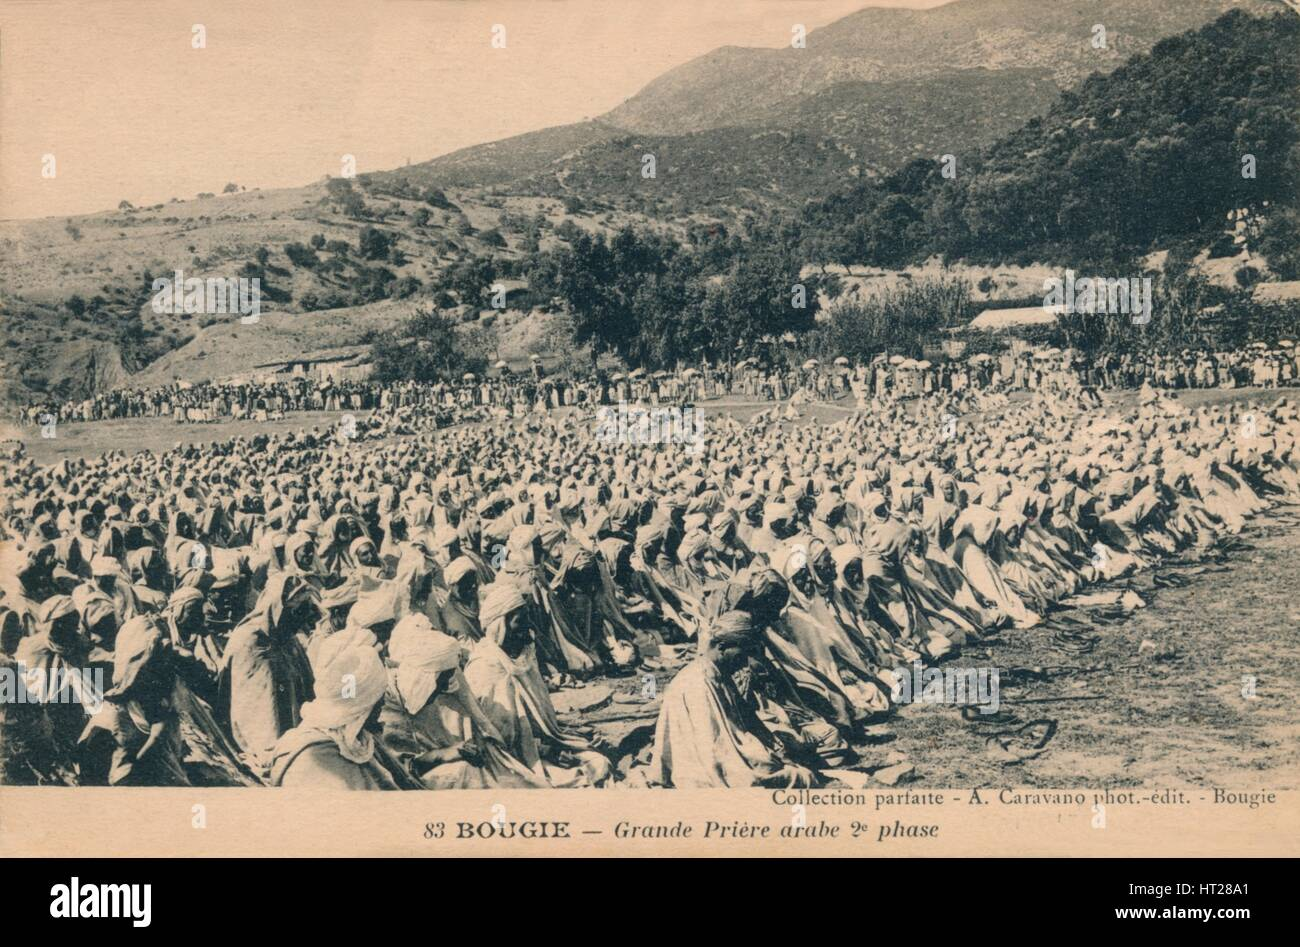 'Bougie - Grande Priere arabe 2e phase', c1900.  Artist: Unknown. Stock Photo